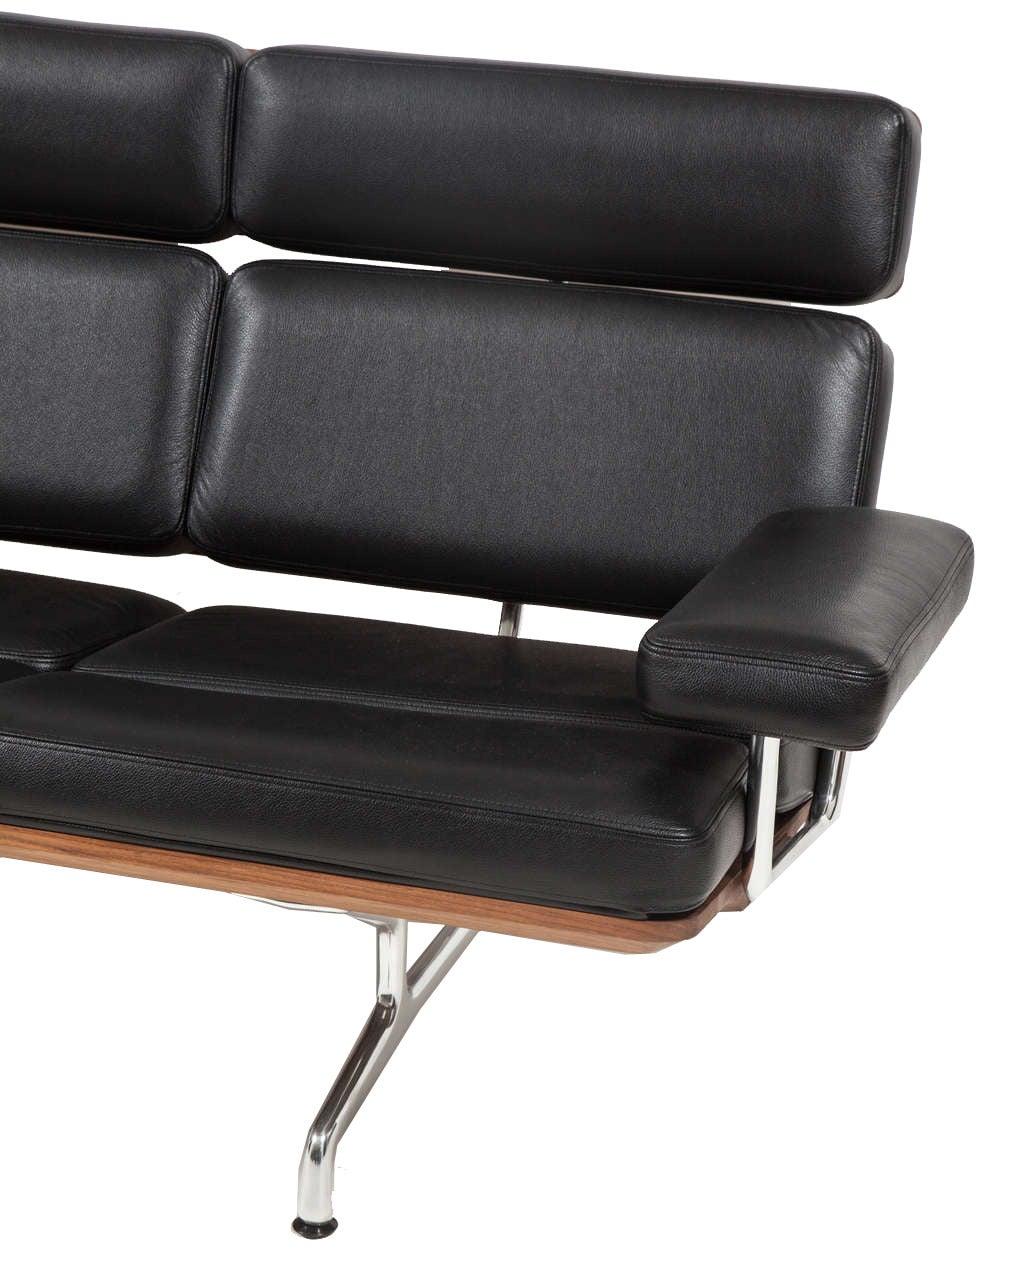 charles eames for herman miller three seat sofa at 1stdibs. Black Bedroom Furniture Sets. Home Design Ideas